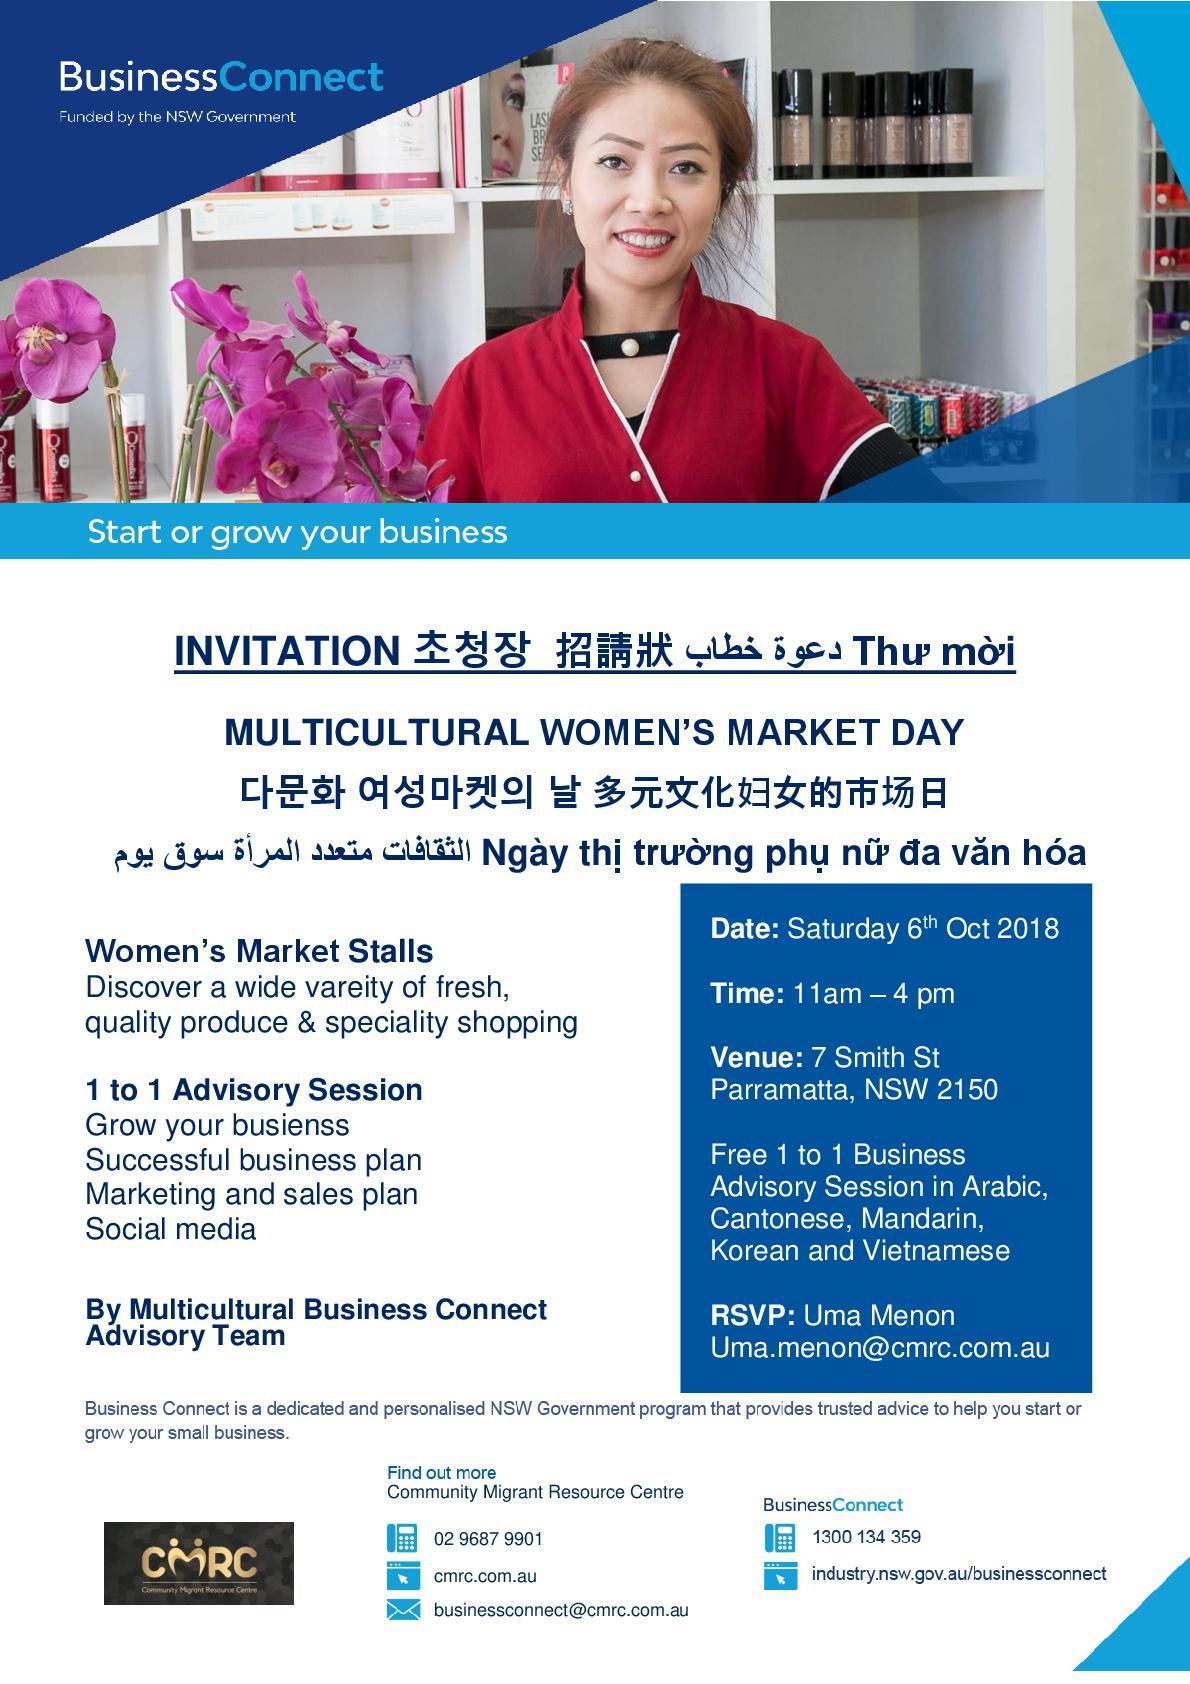 CMRC Multicultural Women's Market Day 6 October-001.jpg